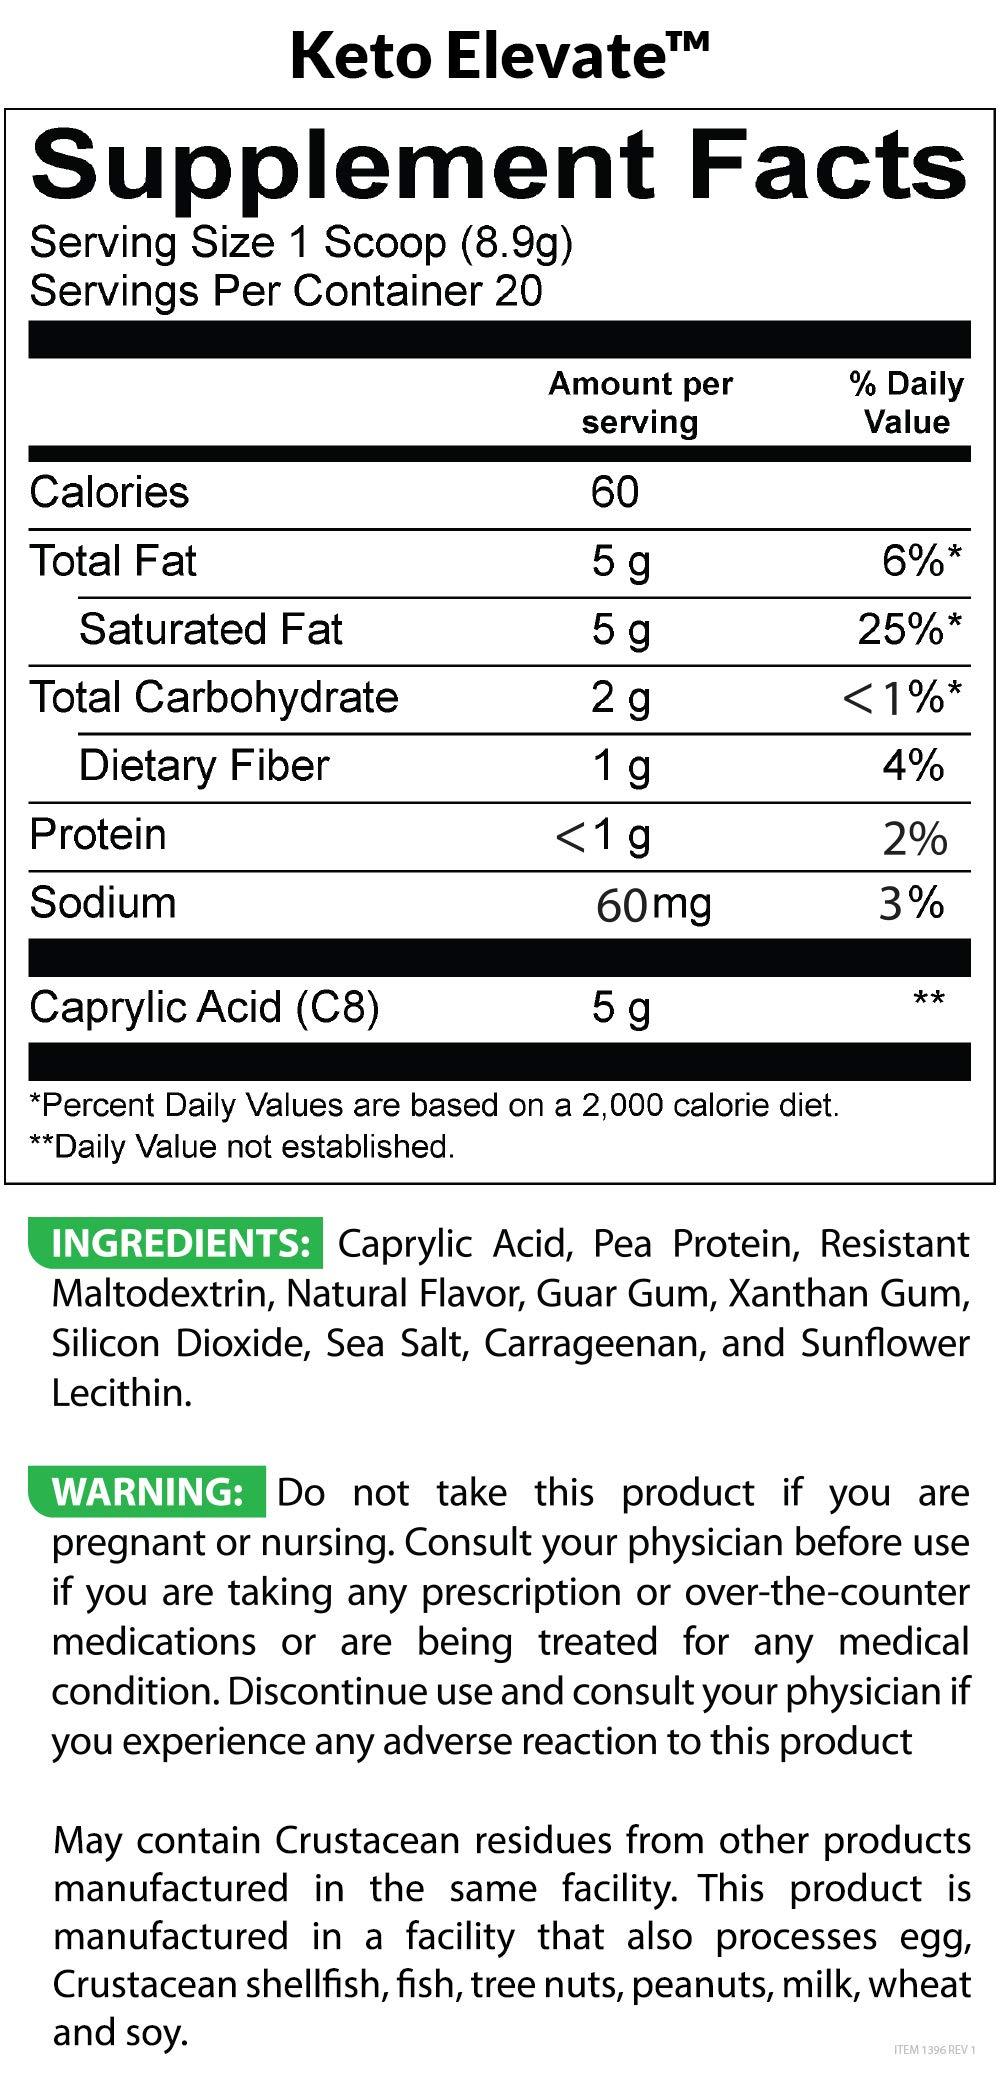 BioTrust Keto Elevate - Keto Boosting Pure C8 MCT Oil Powder   Ketogenic Diet Supplement   Keto Coffee Creamer   100% Caprylic Acid by BioTrust